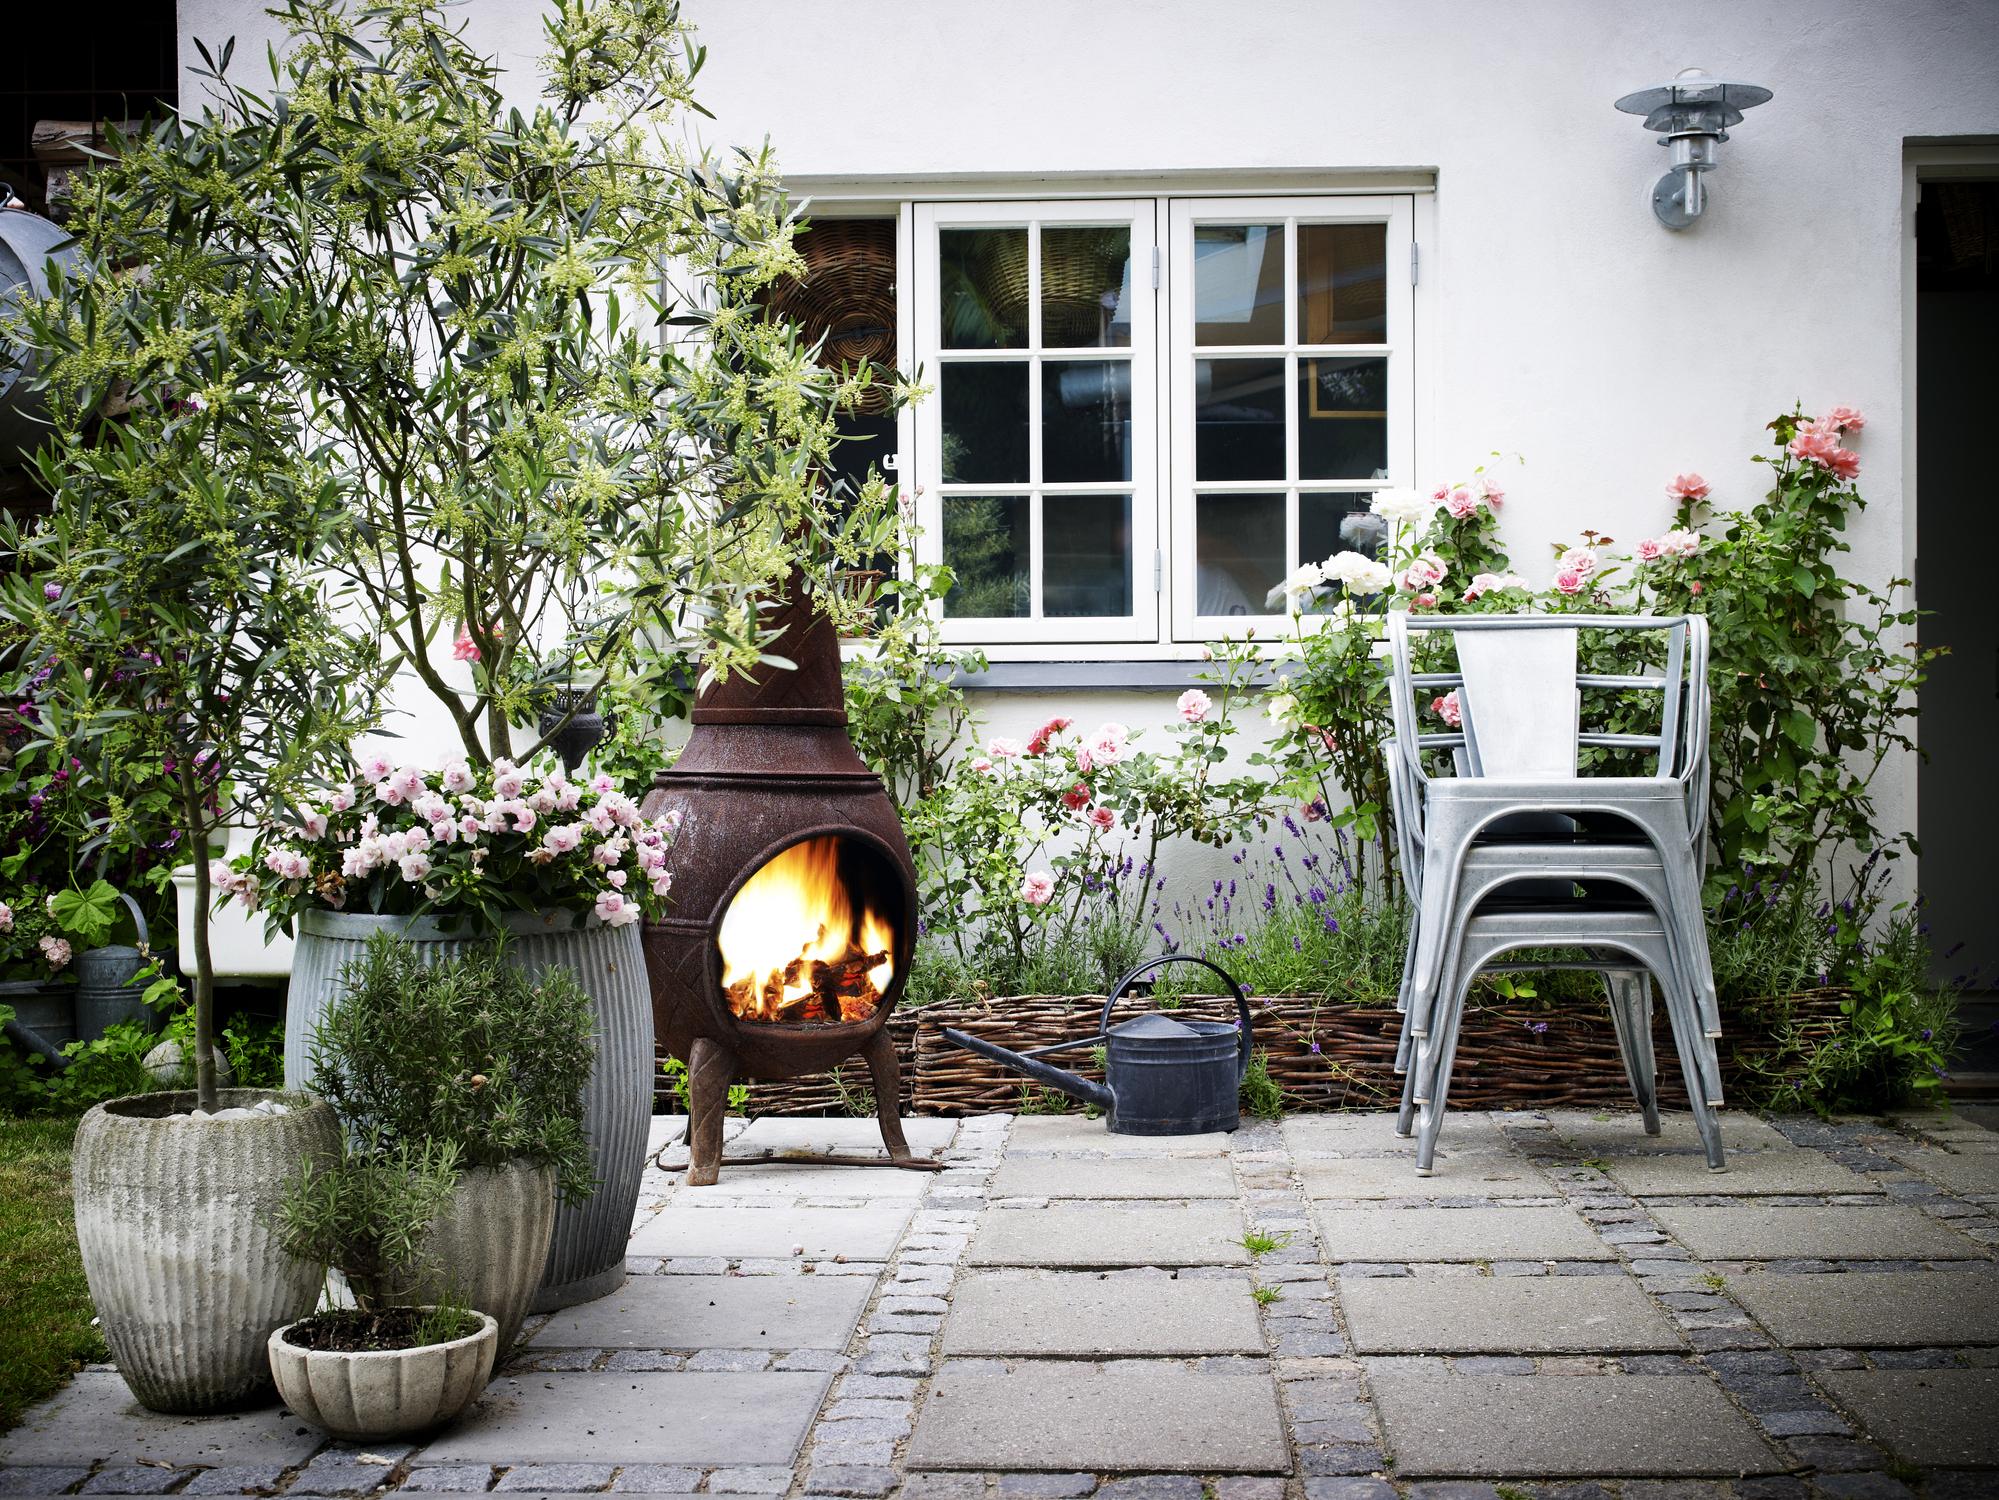 Garden terrace and fireplace